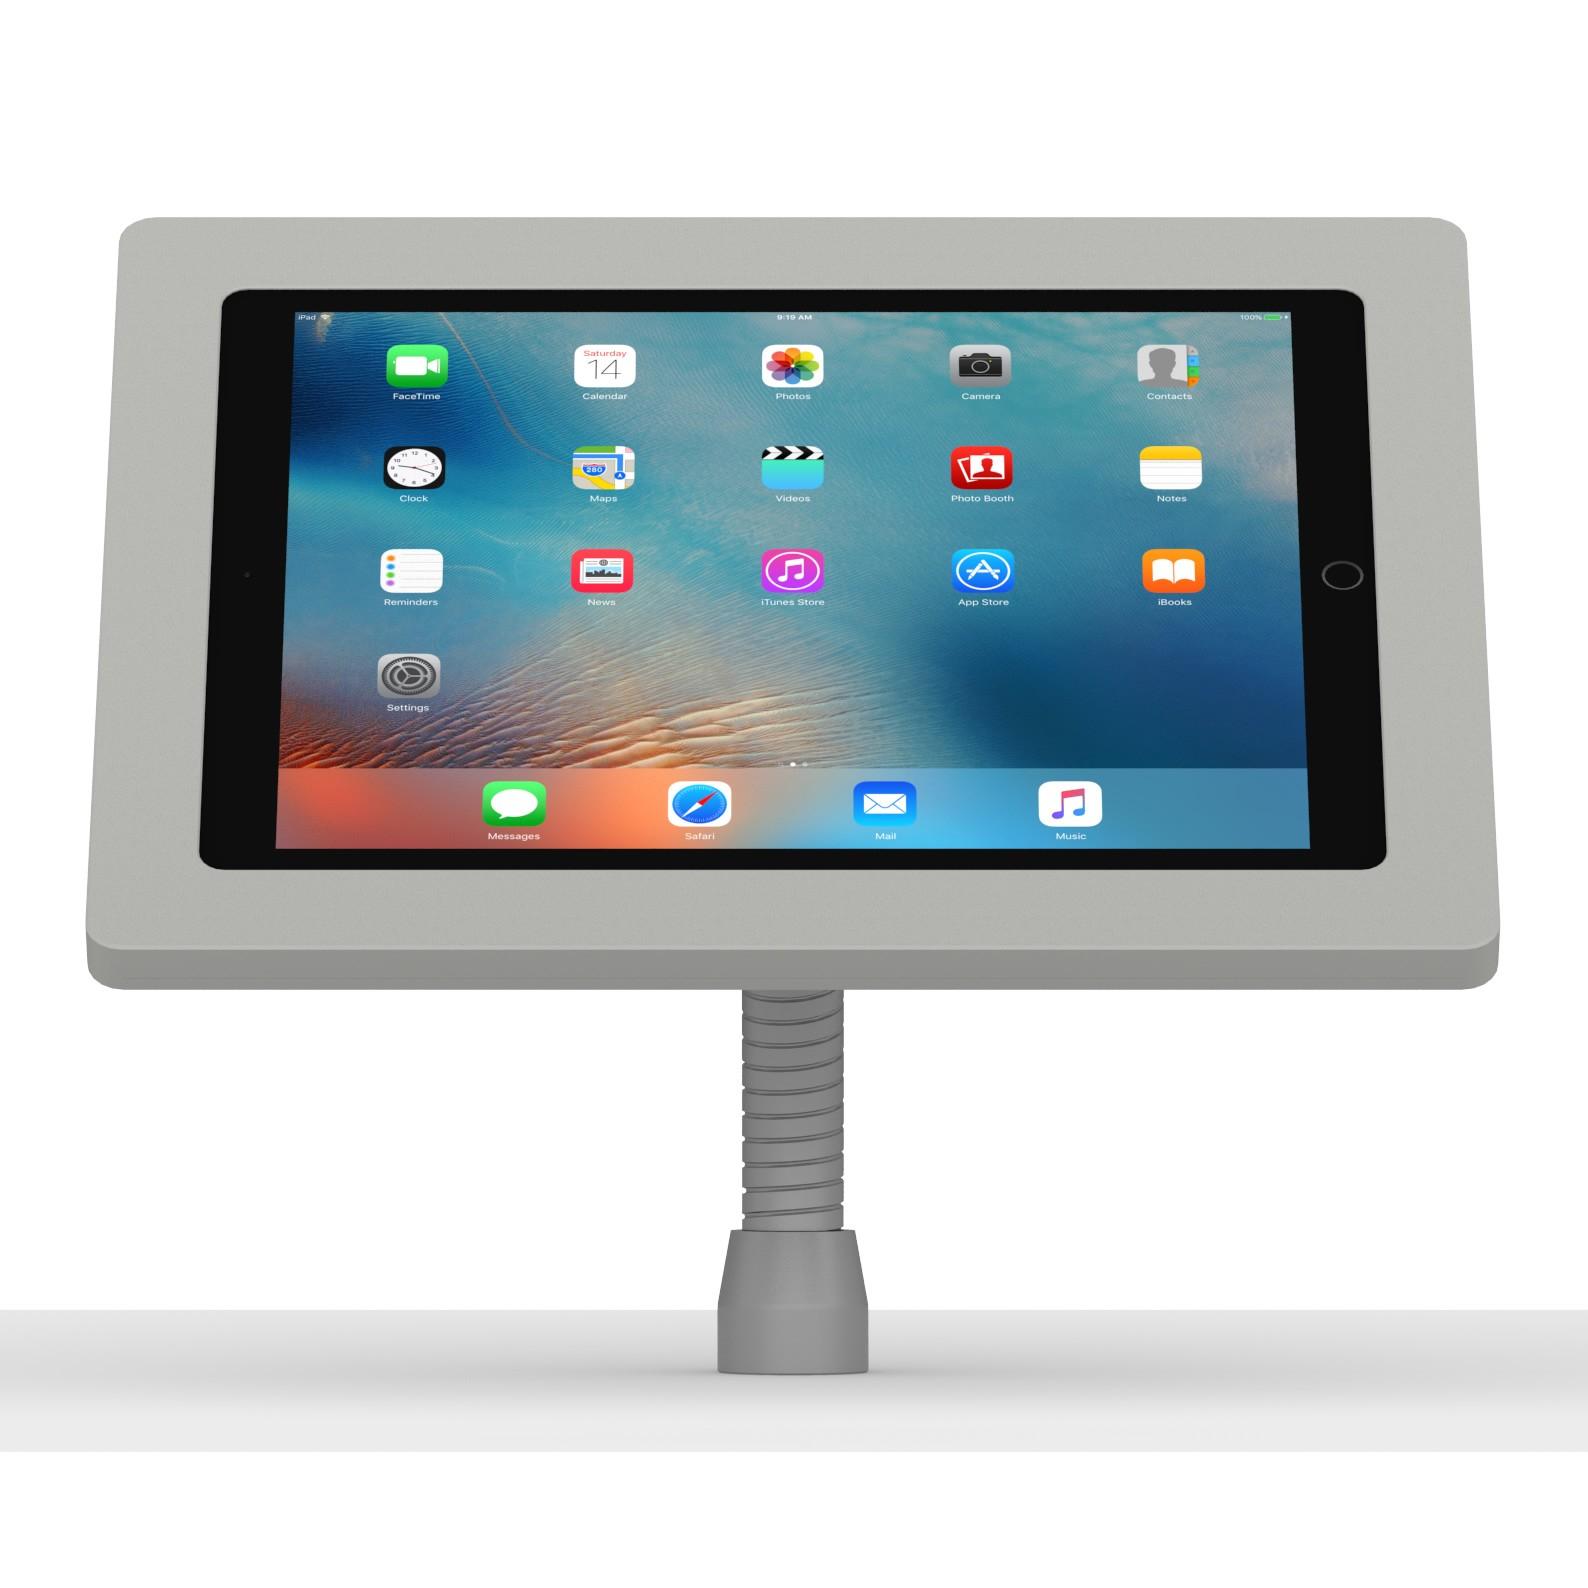 12 9 Inch Ipad Pro Light Grey Enclosure W Flexible Desk